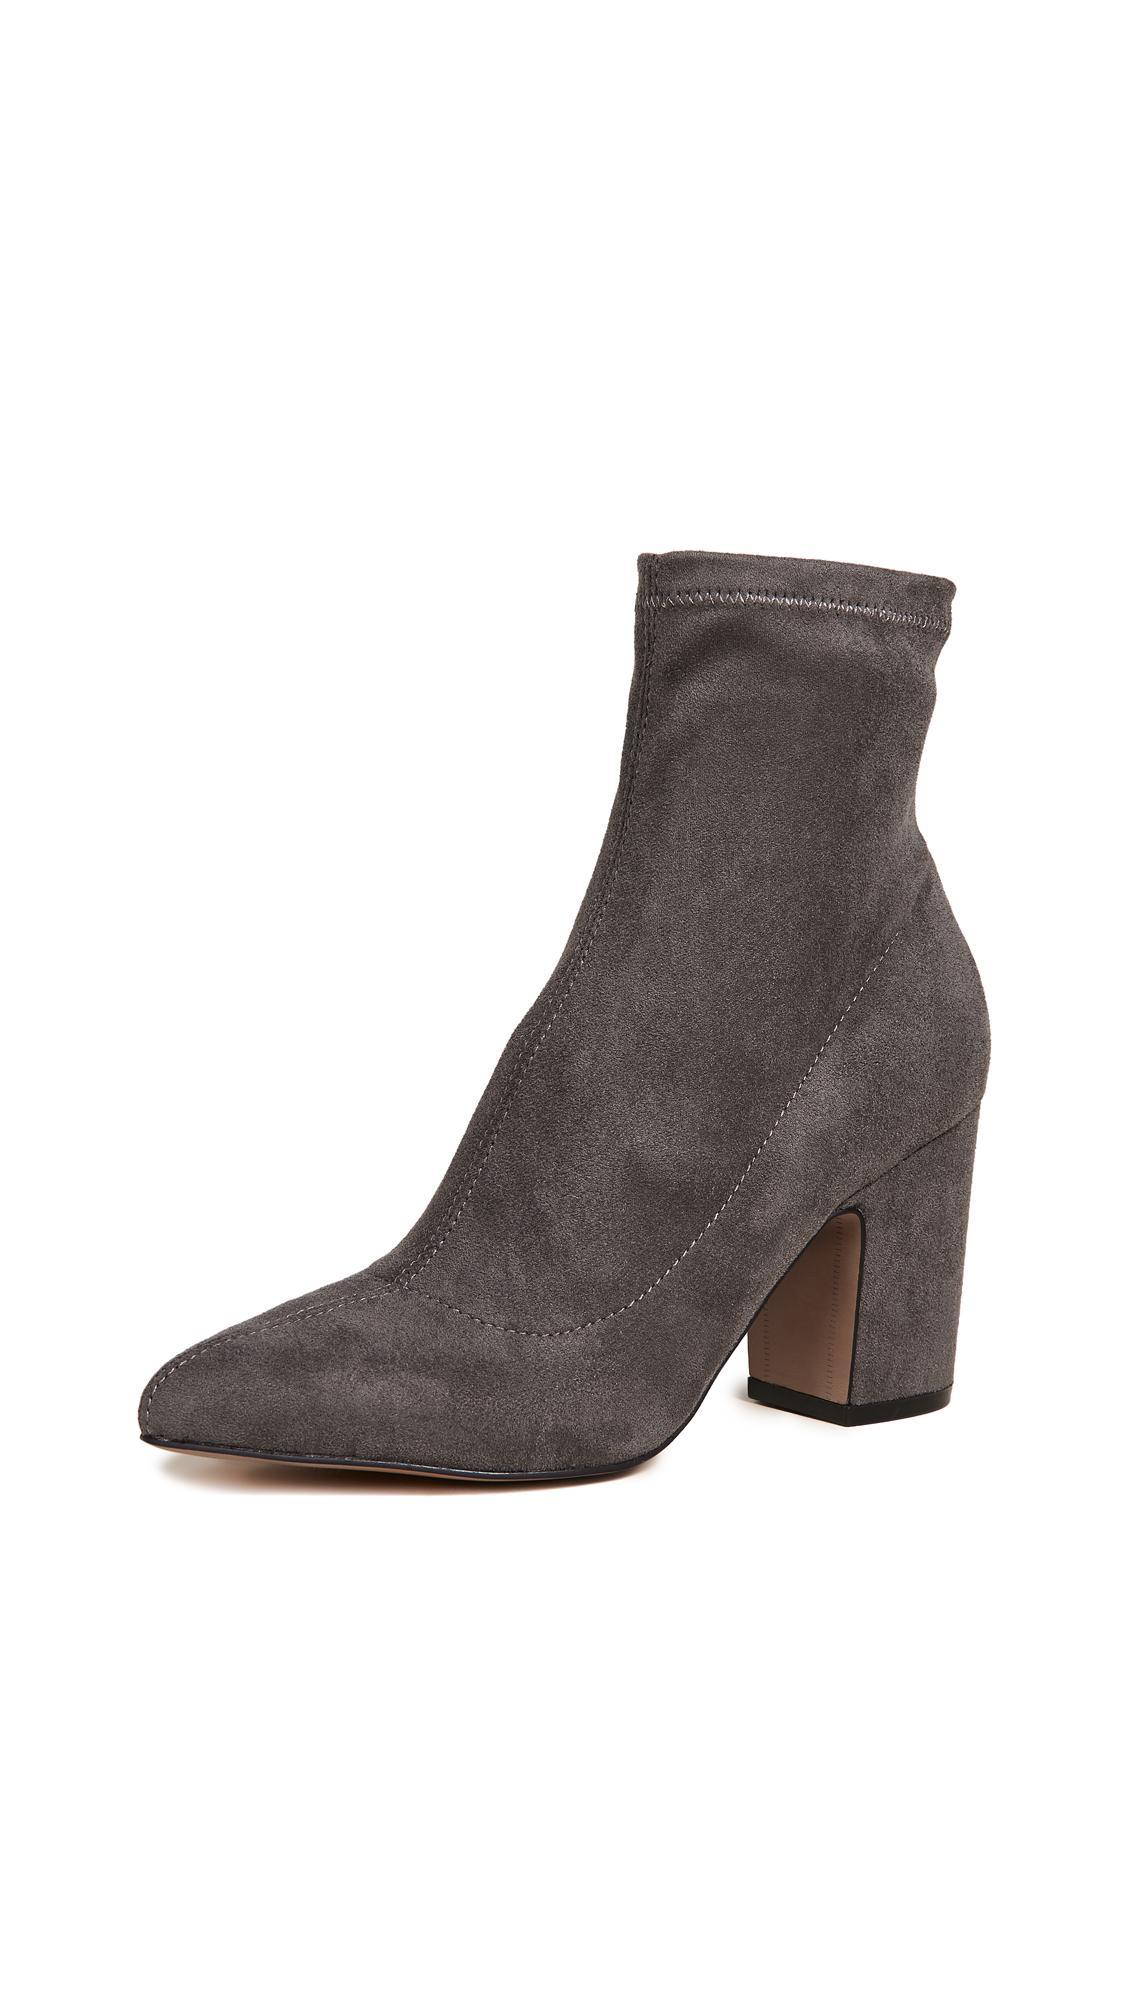 c24998226a4 Leandra Block Heel Ankle Booties in Grey